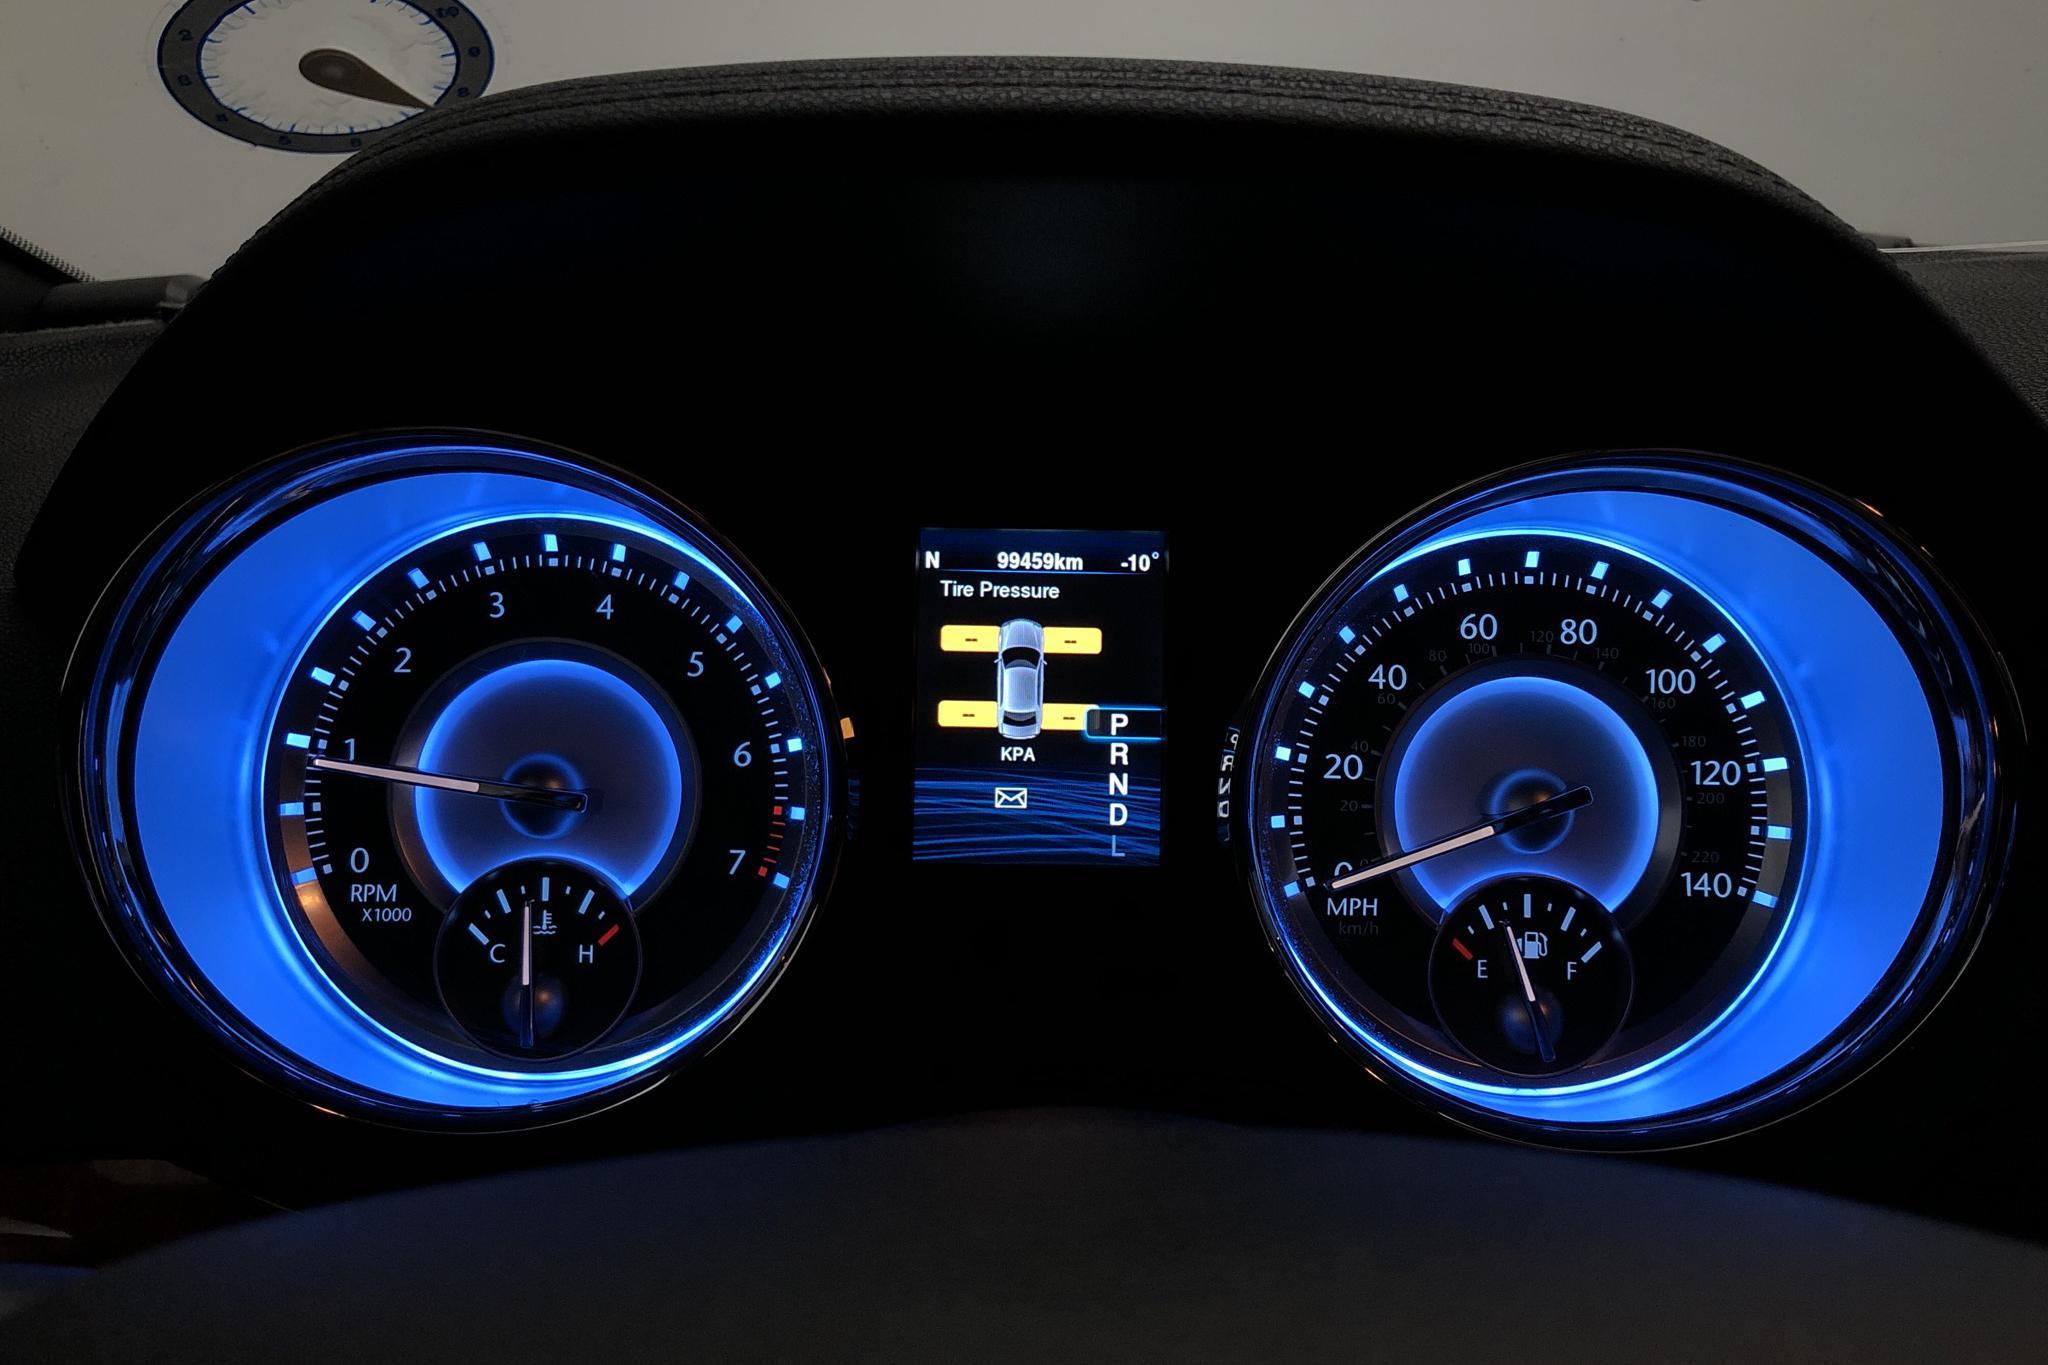 Chrysler 300C AWD 3.6 V6 (292hk) - 9 945 mil - Automat - Dark Grey - 2014